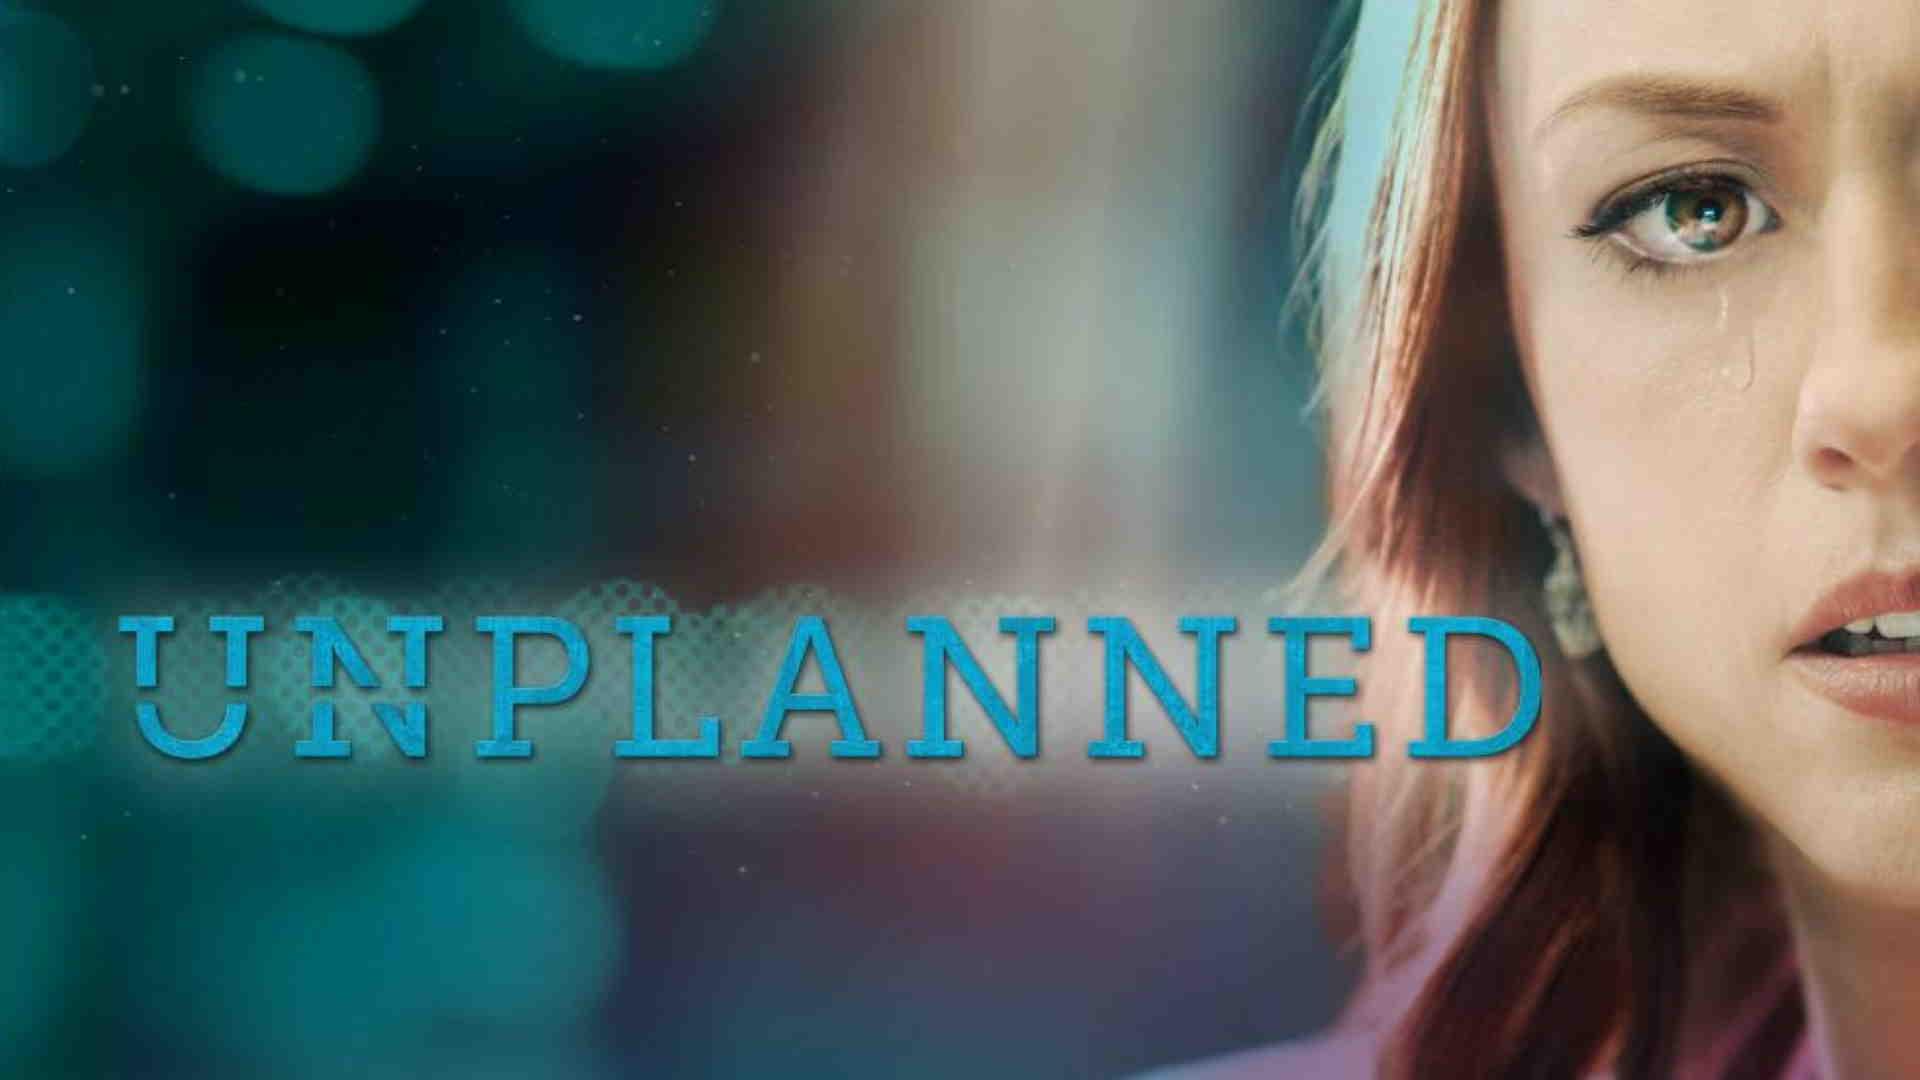 UNPLANNED Movie Expands in Australia